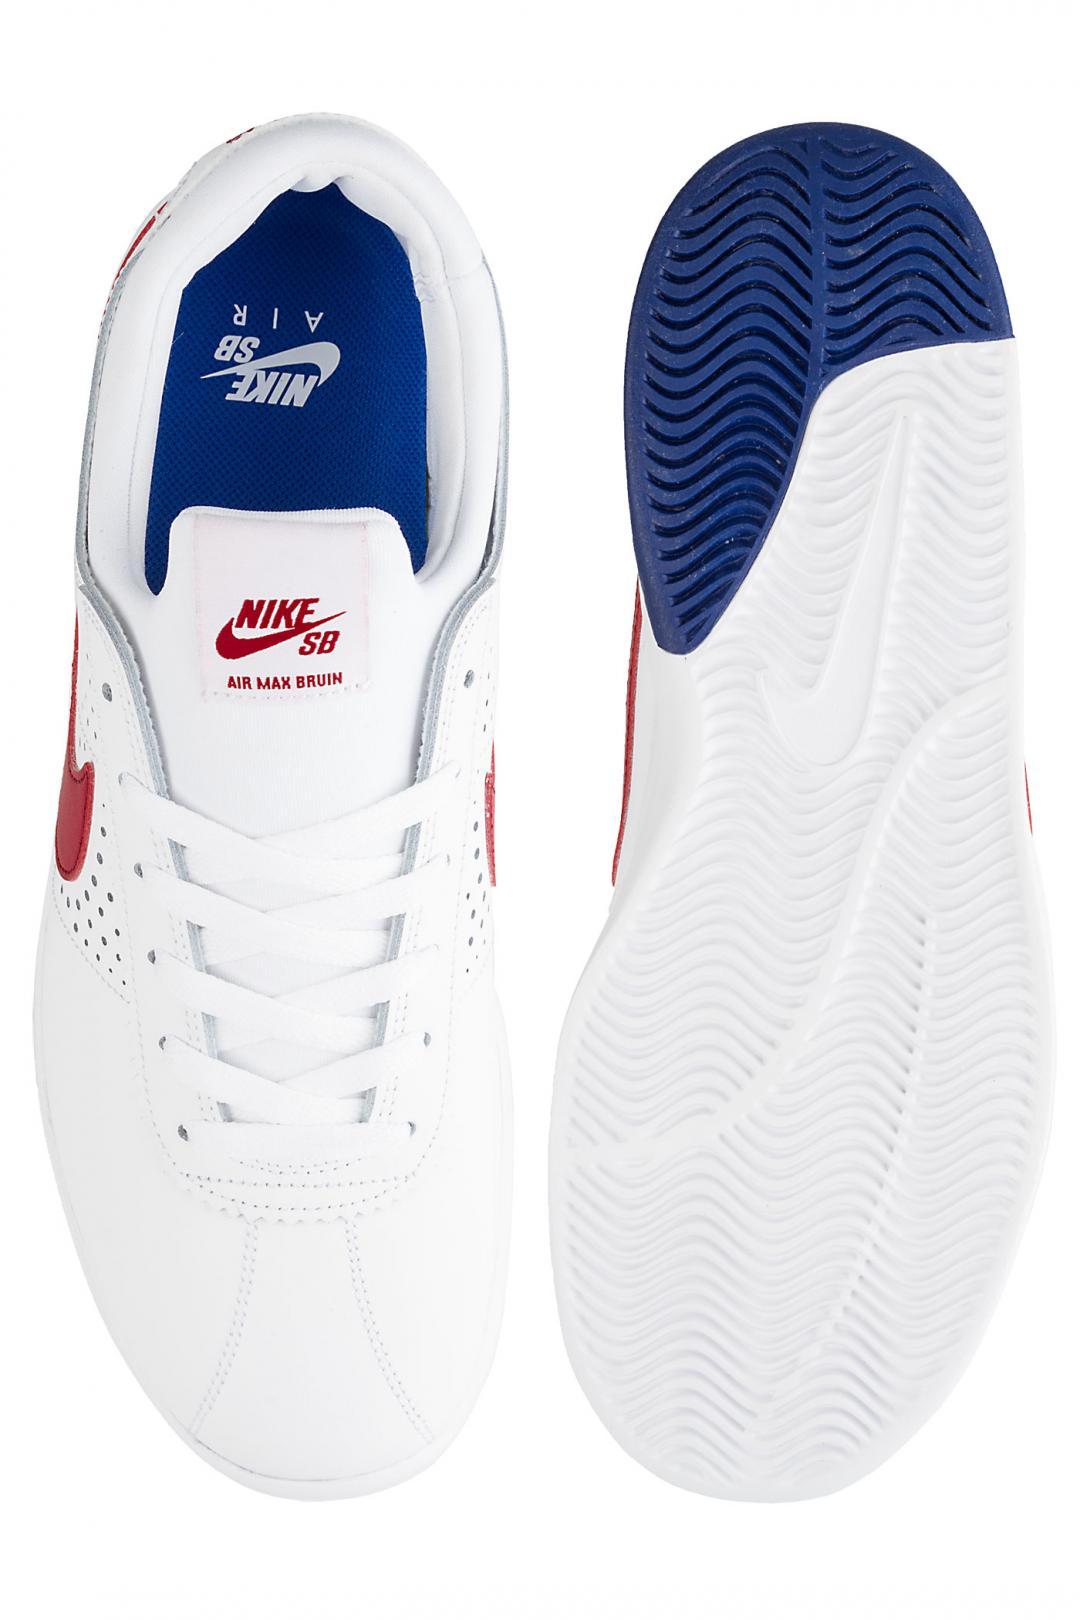 Uomo Nike SB Air Max Bruin Vapor white gym red | Sneakers low top